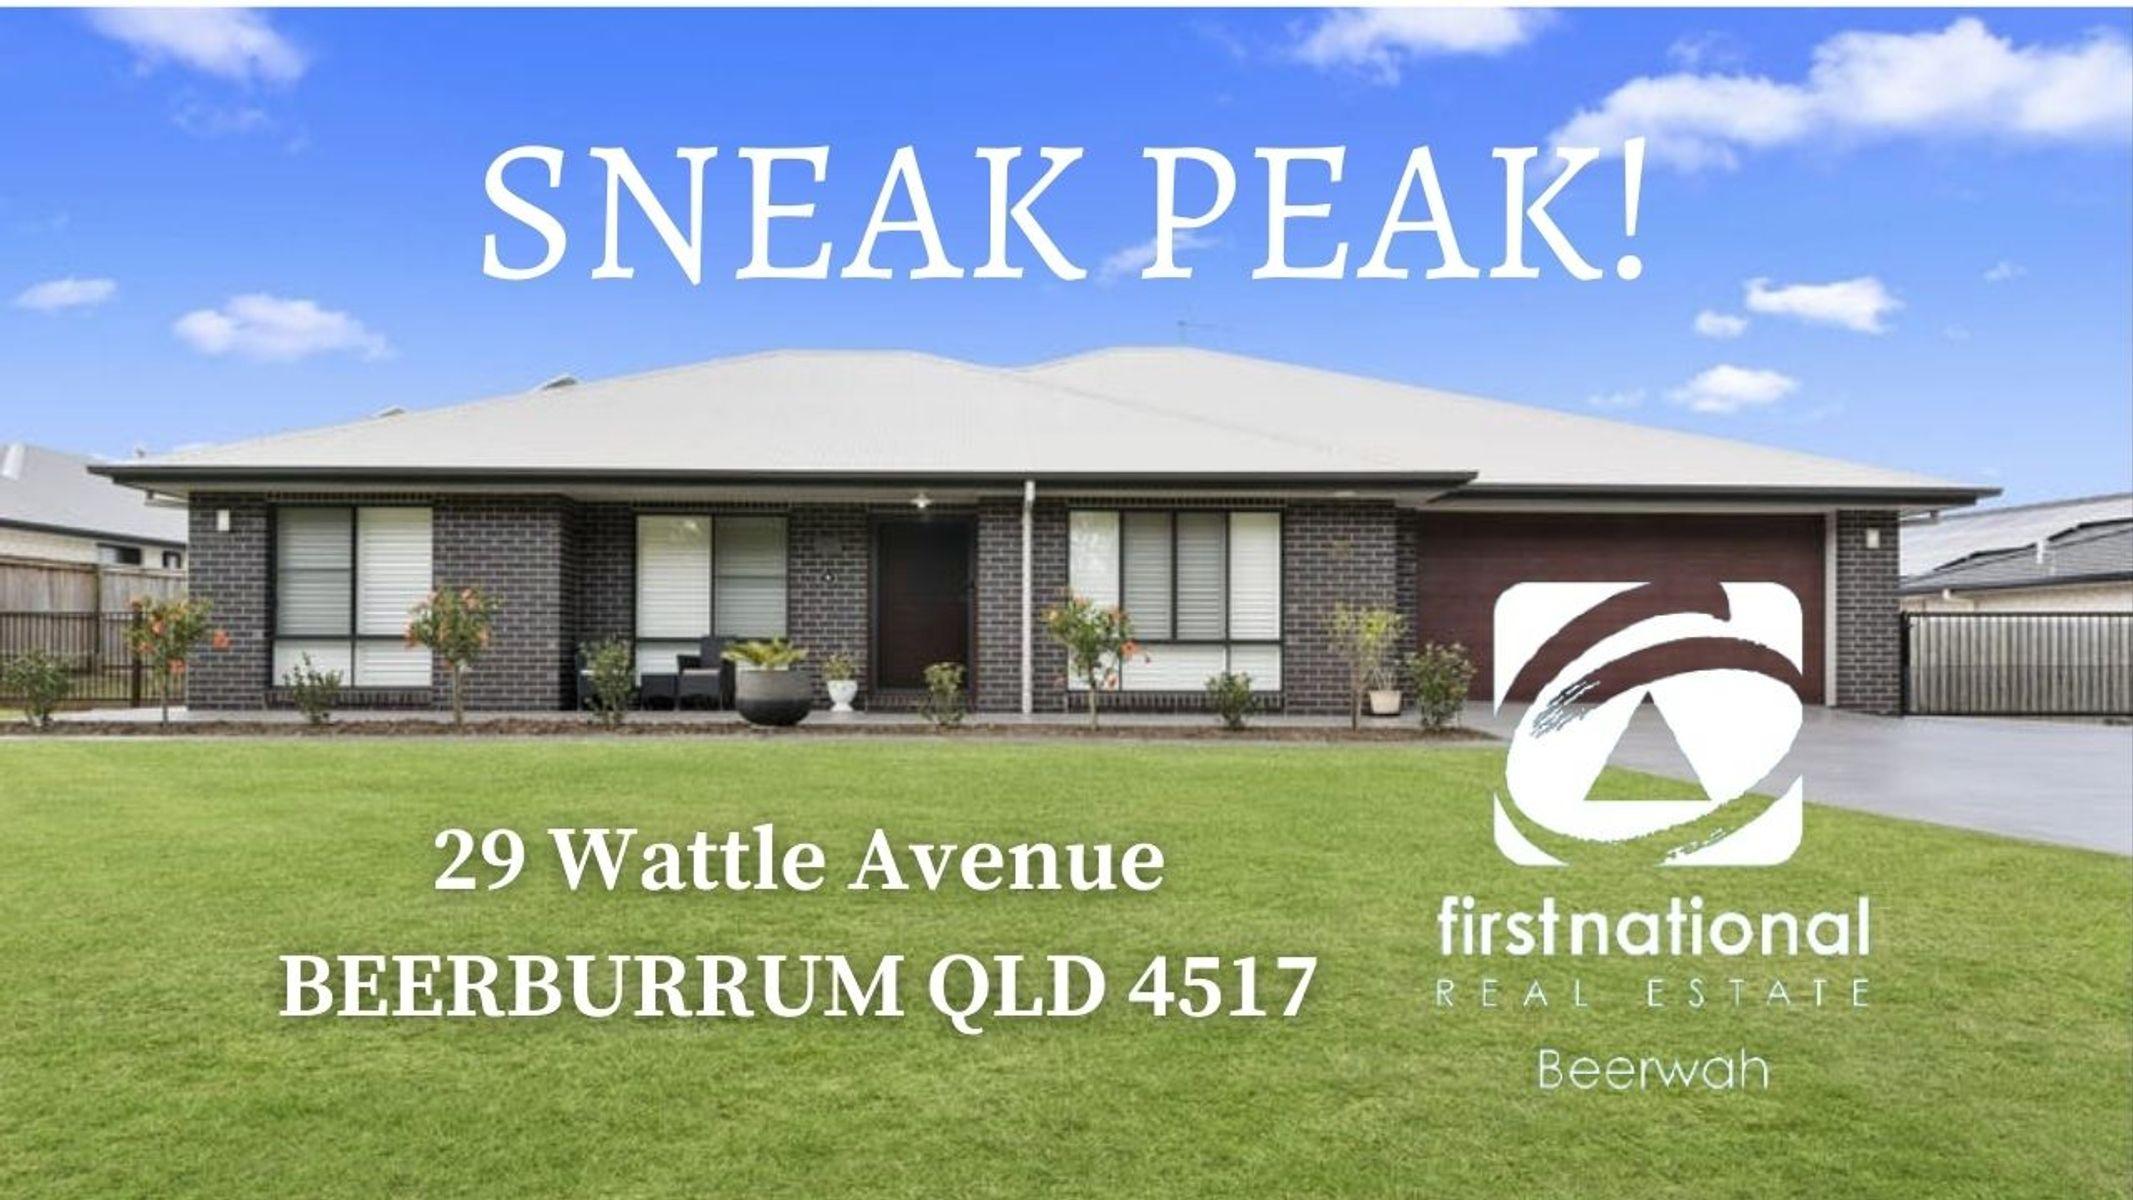 29 Wattle Avenue, Beerburrum, QLD 4517